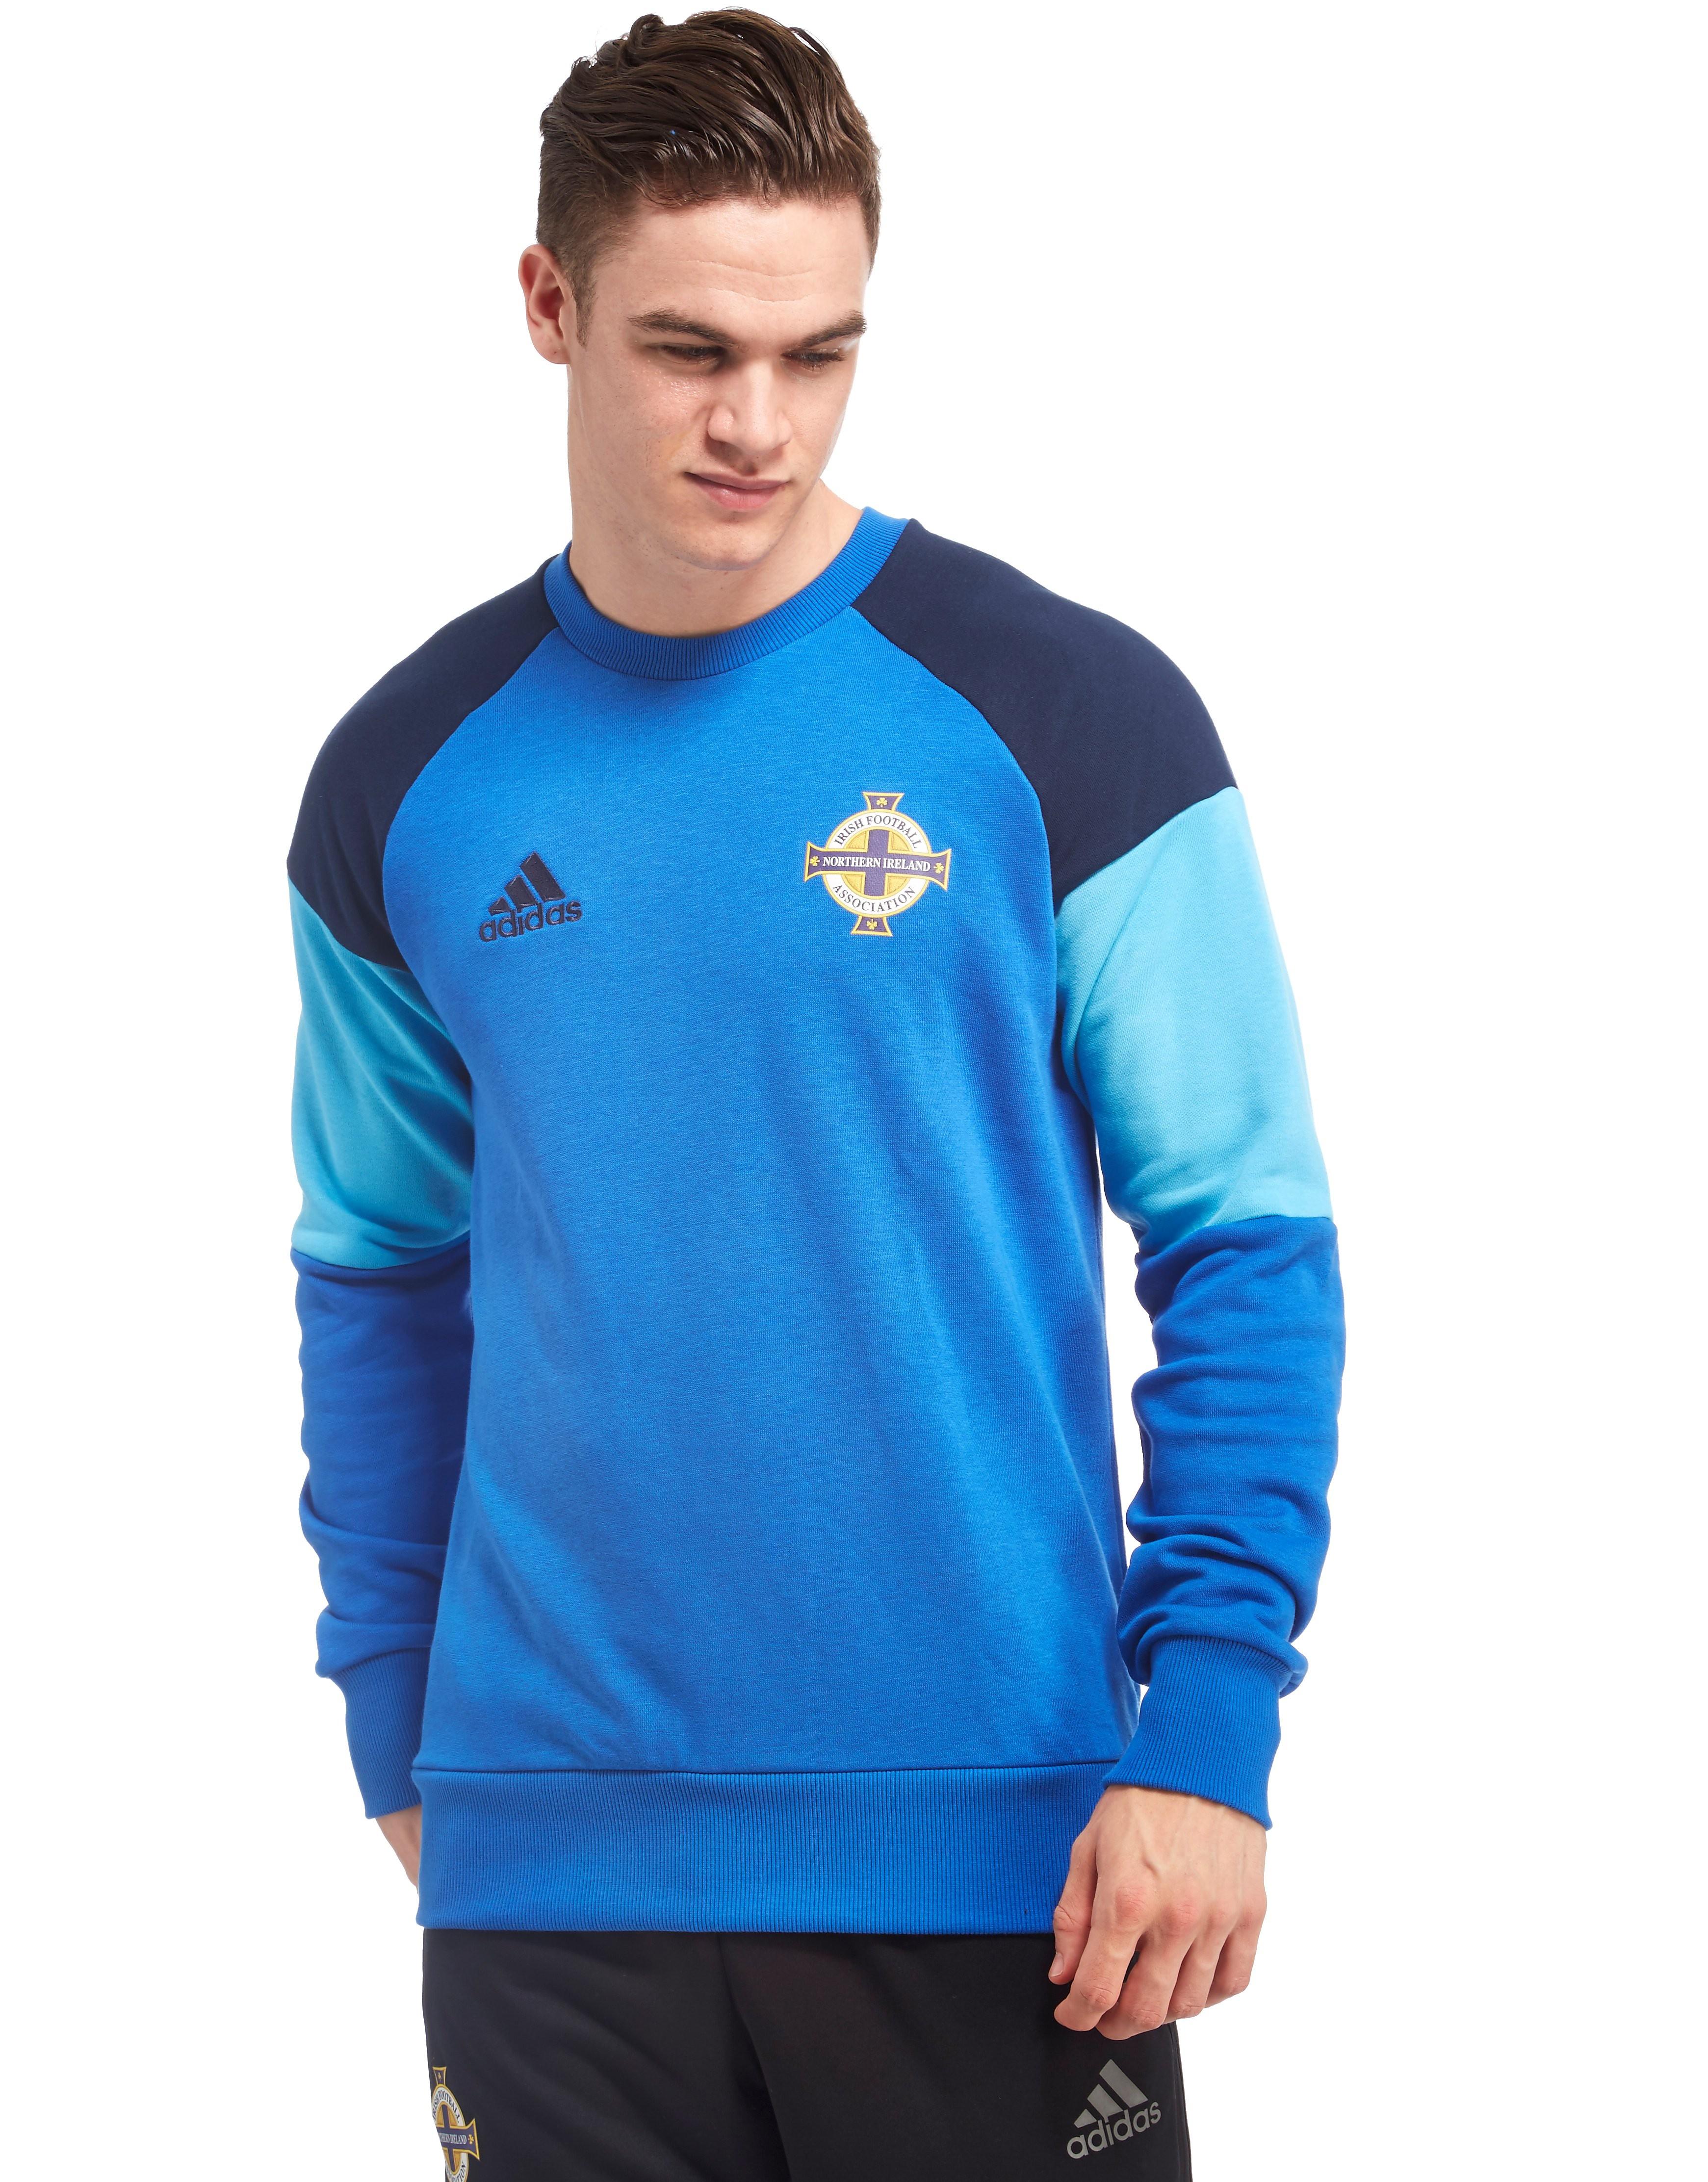 adidas Northern Ireland 2016/17 Crew Sweatshirt